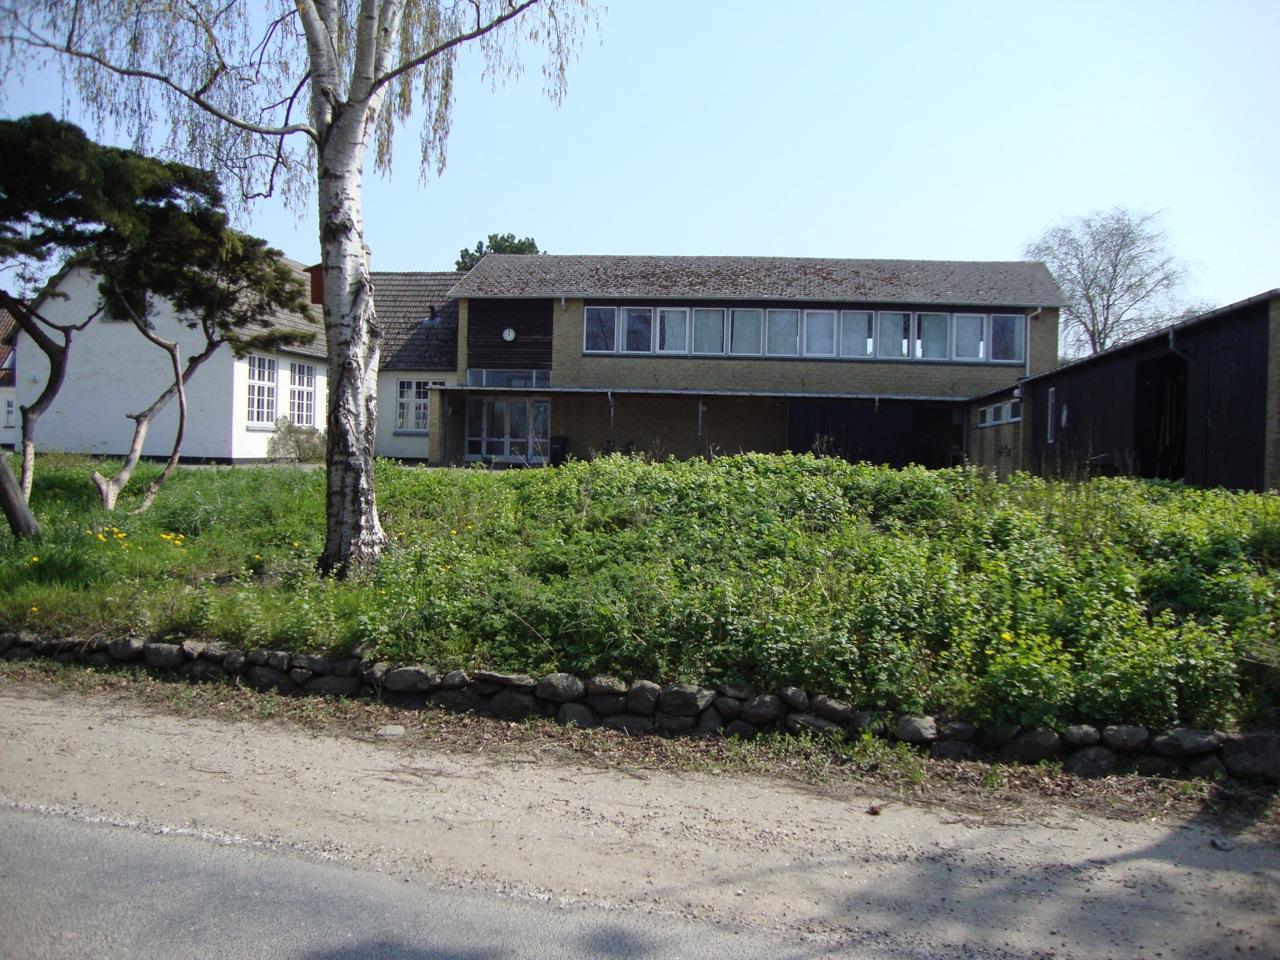 Billede Borgerhus 2013